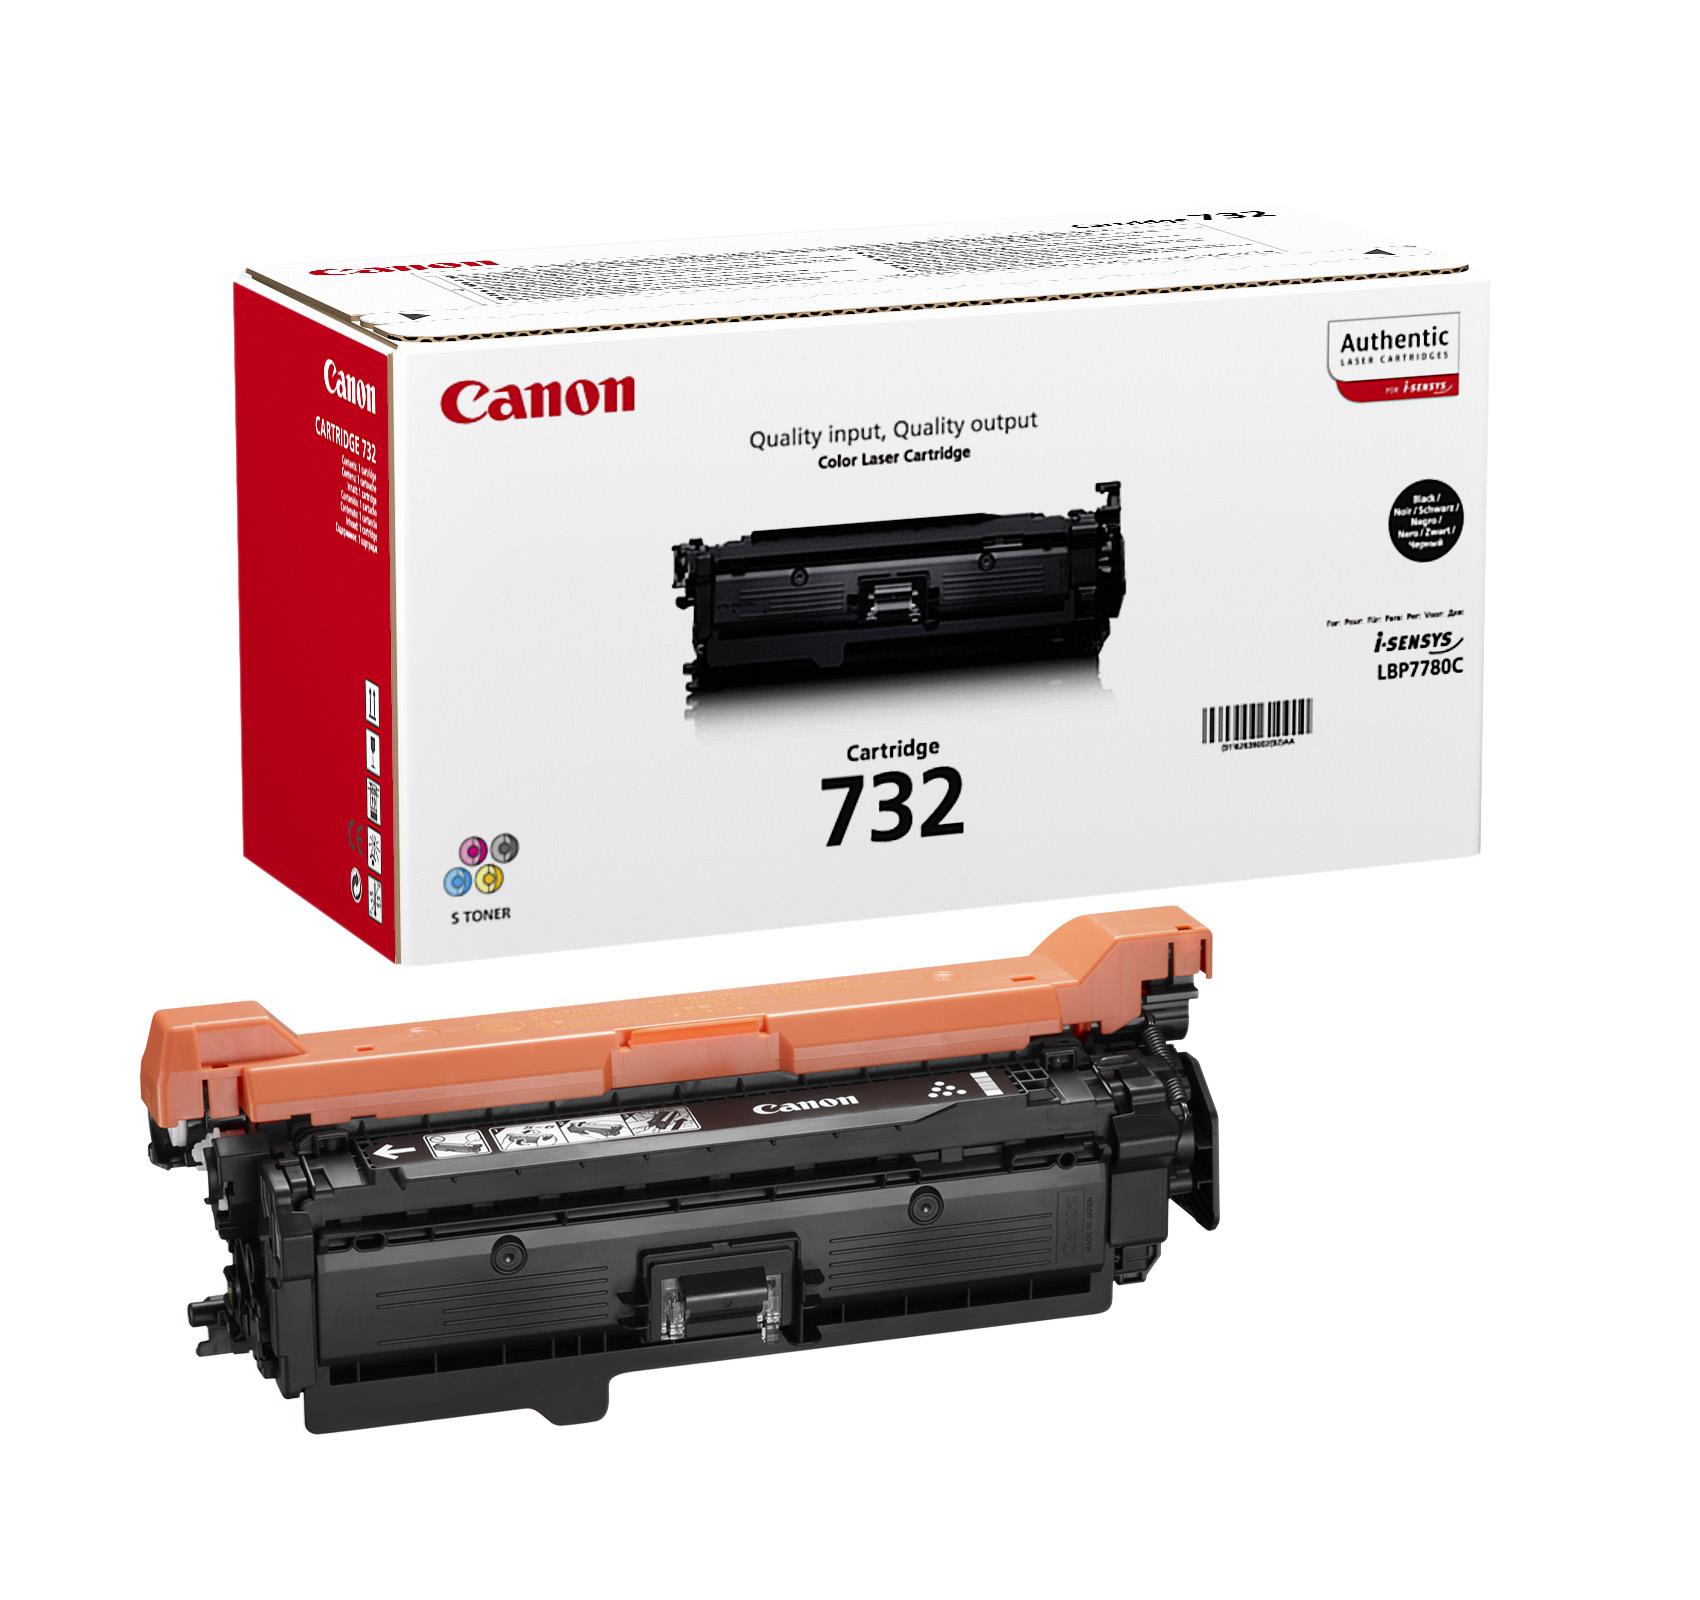 Картридж Canon 732Bk для принтеров LBP7780Cx. Чёрный. 6100 страниц. hot selling lower fuser roller for canon ir7095 ir7086 7095 7105 7200 8500 9070 bottom pressure roller